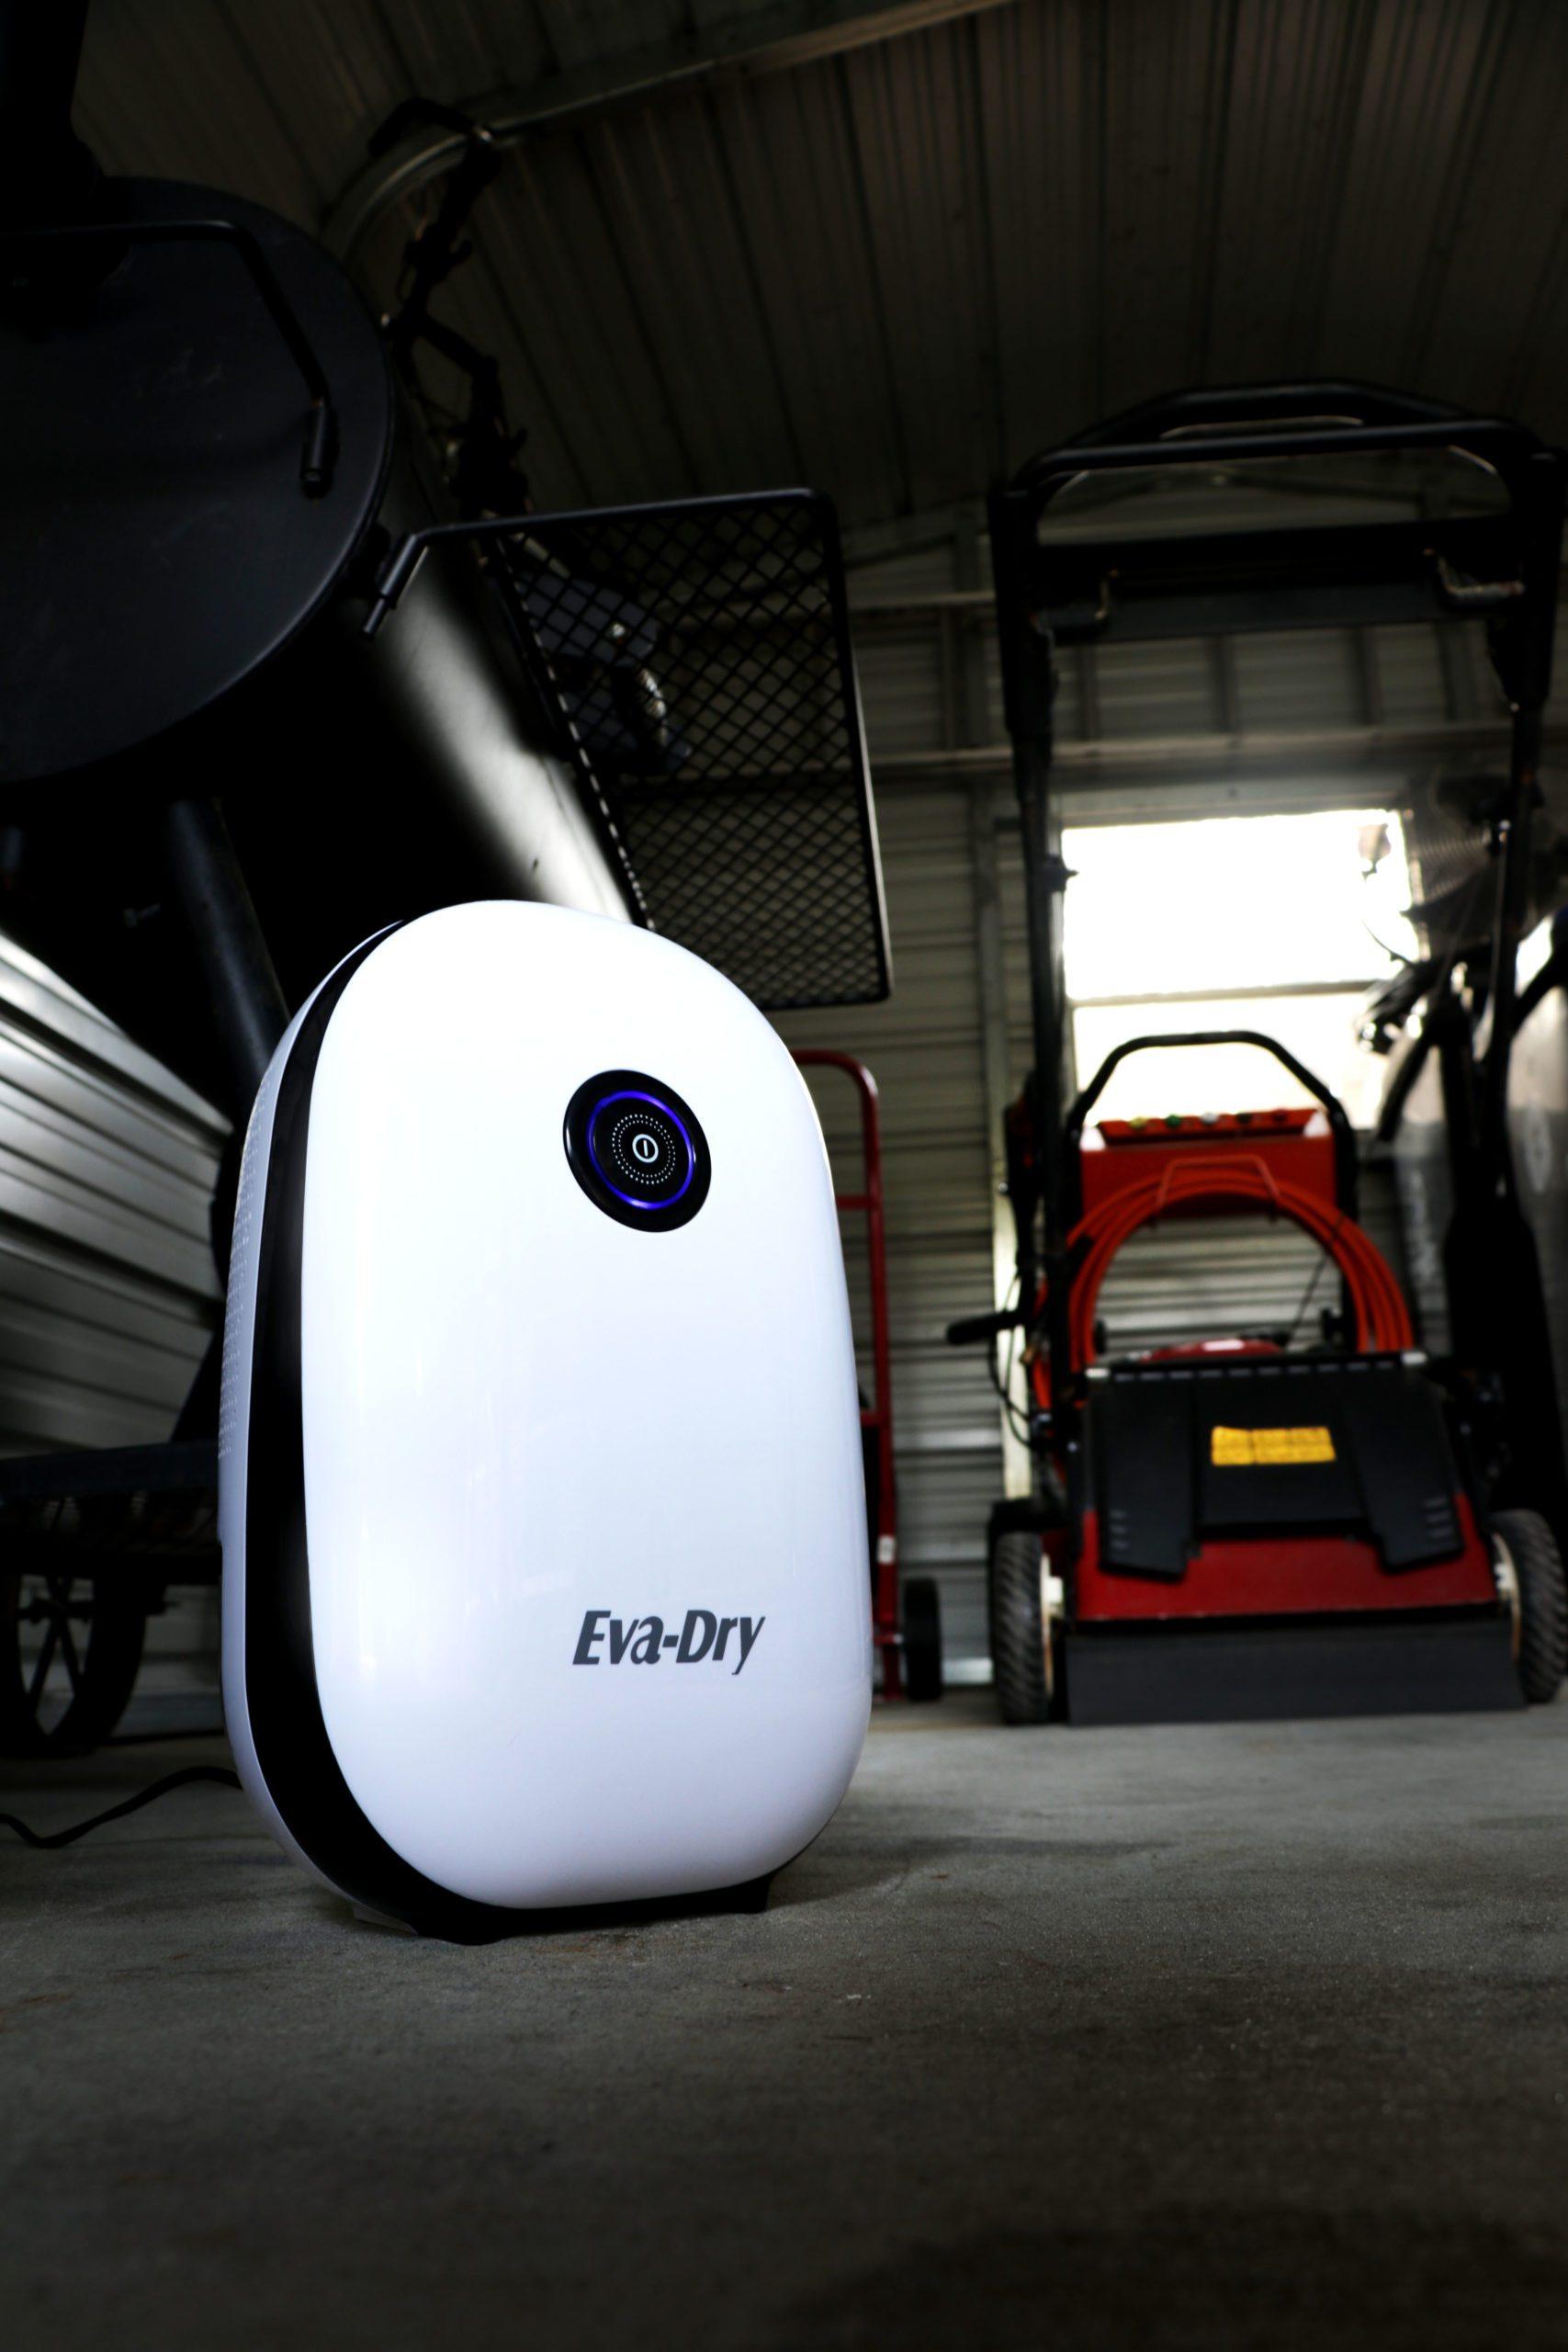 Eva Dry EDV-2500 Mid Size 20.5 Ounce 2,500 Cubic Feet Home Electric Dehumidifier